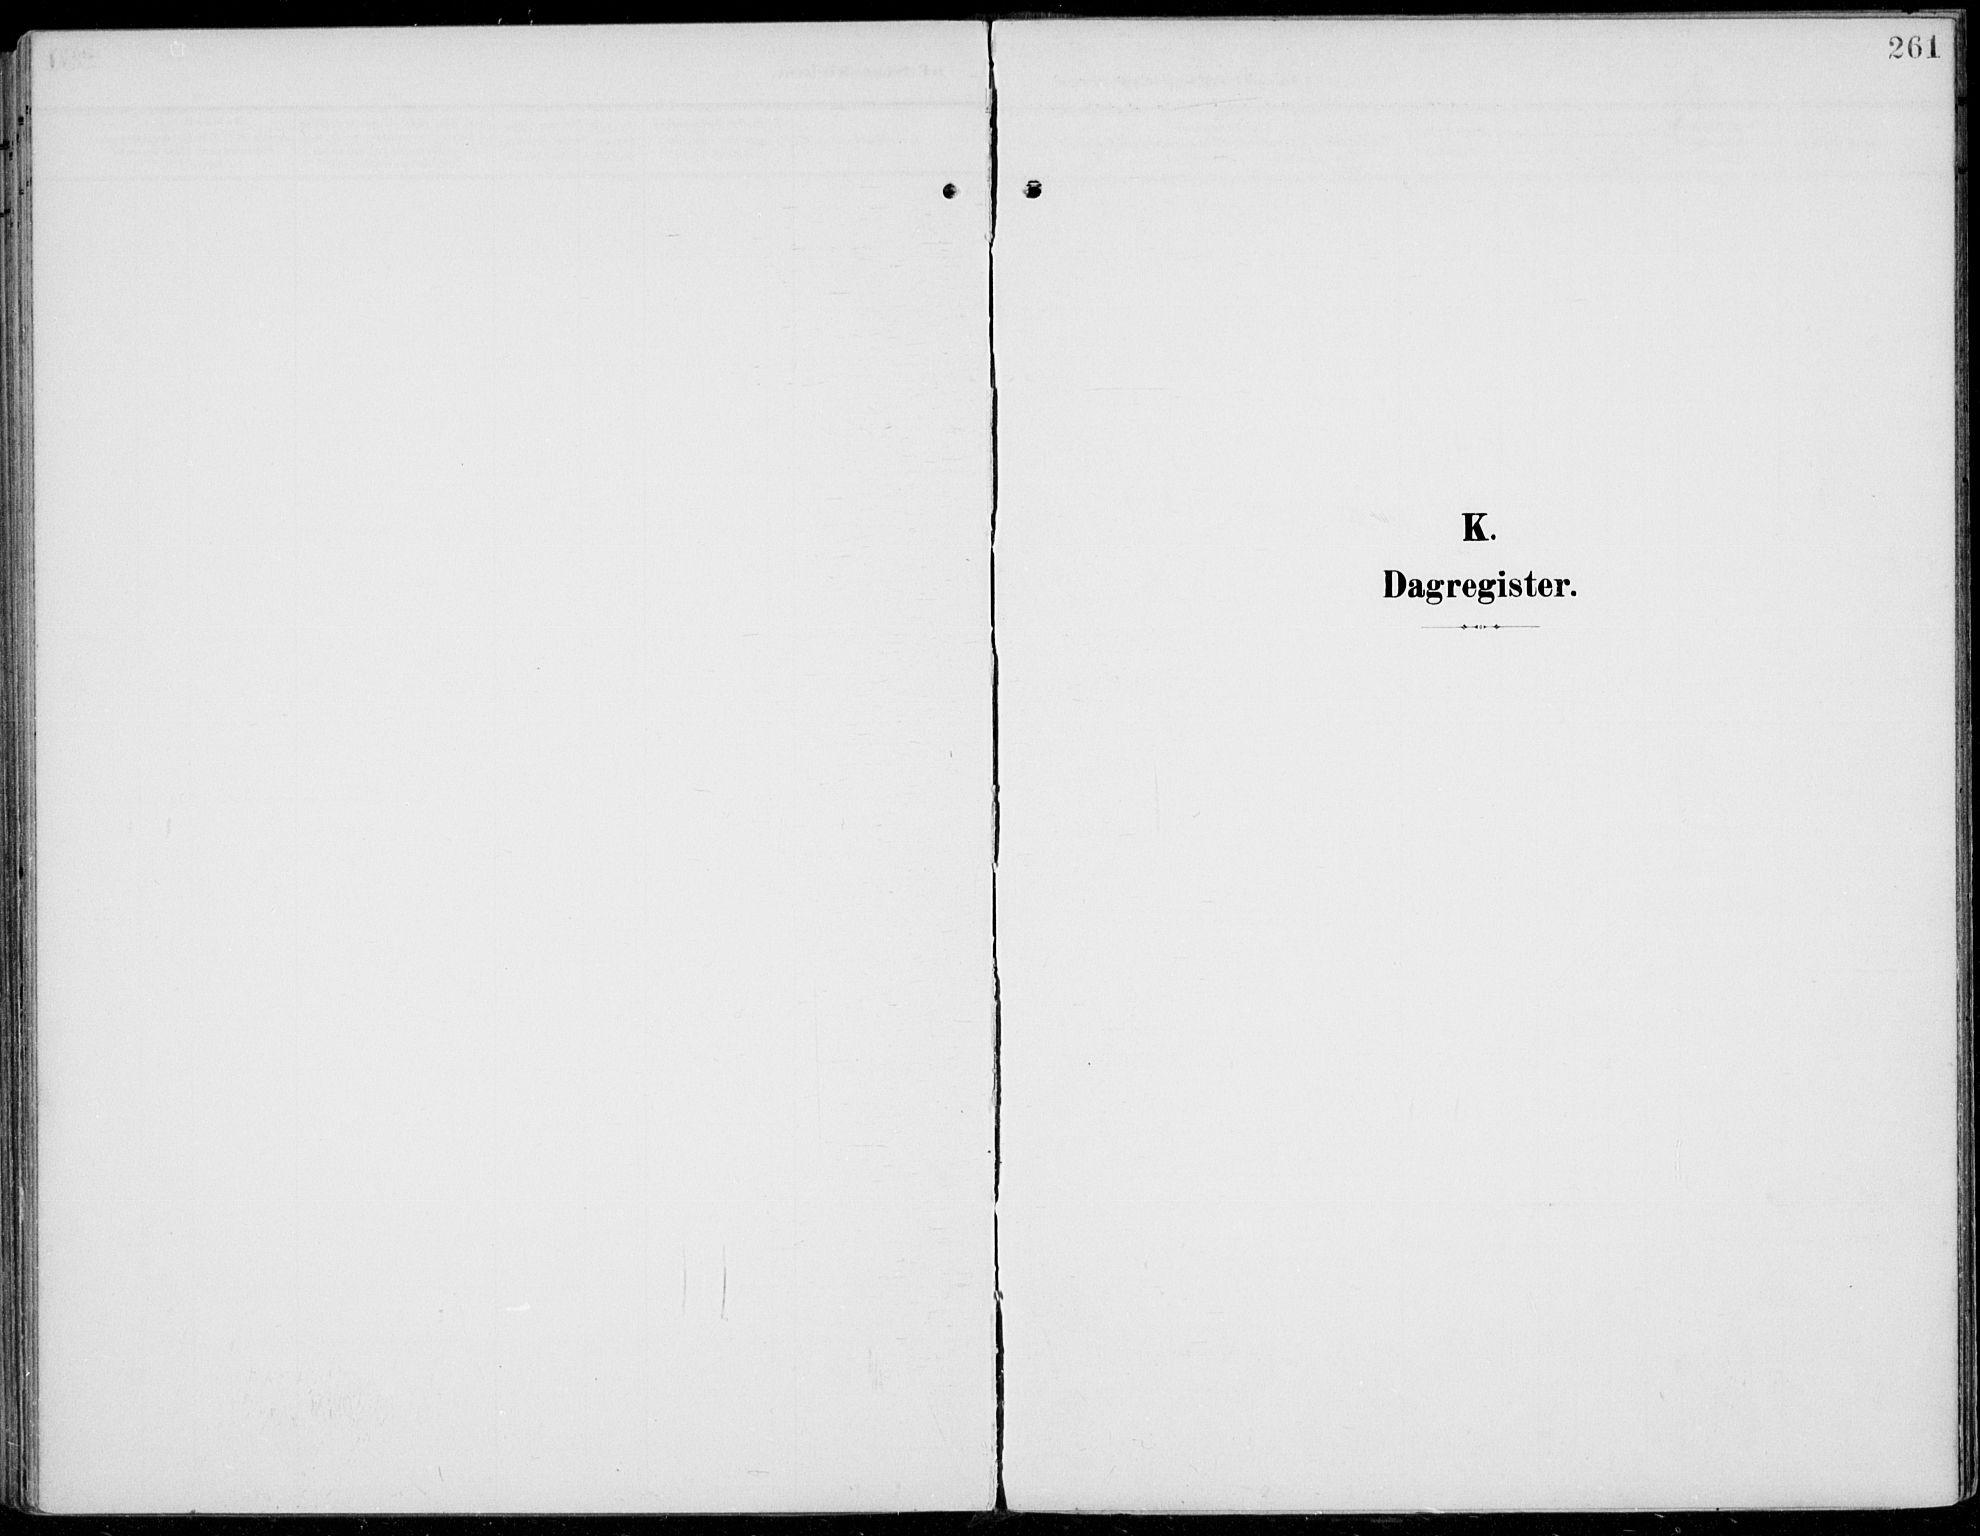 SAH, Jevnaker prestekontor, Ministerialbok nr. 11, 1902-1913, s. 261